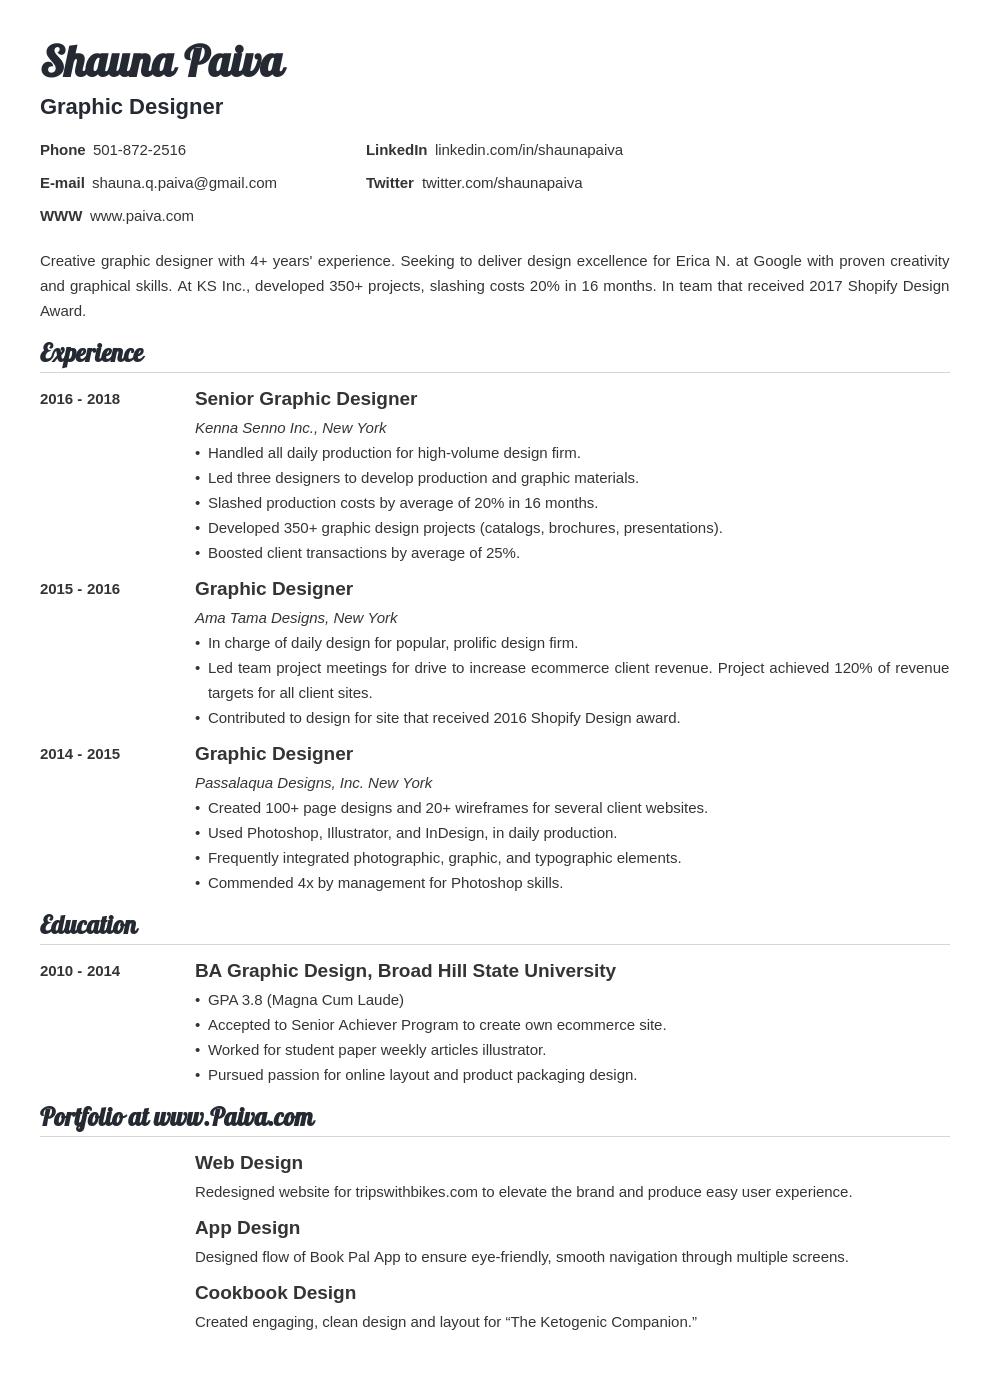 resume look template valera